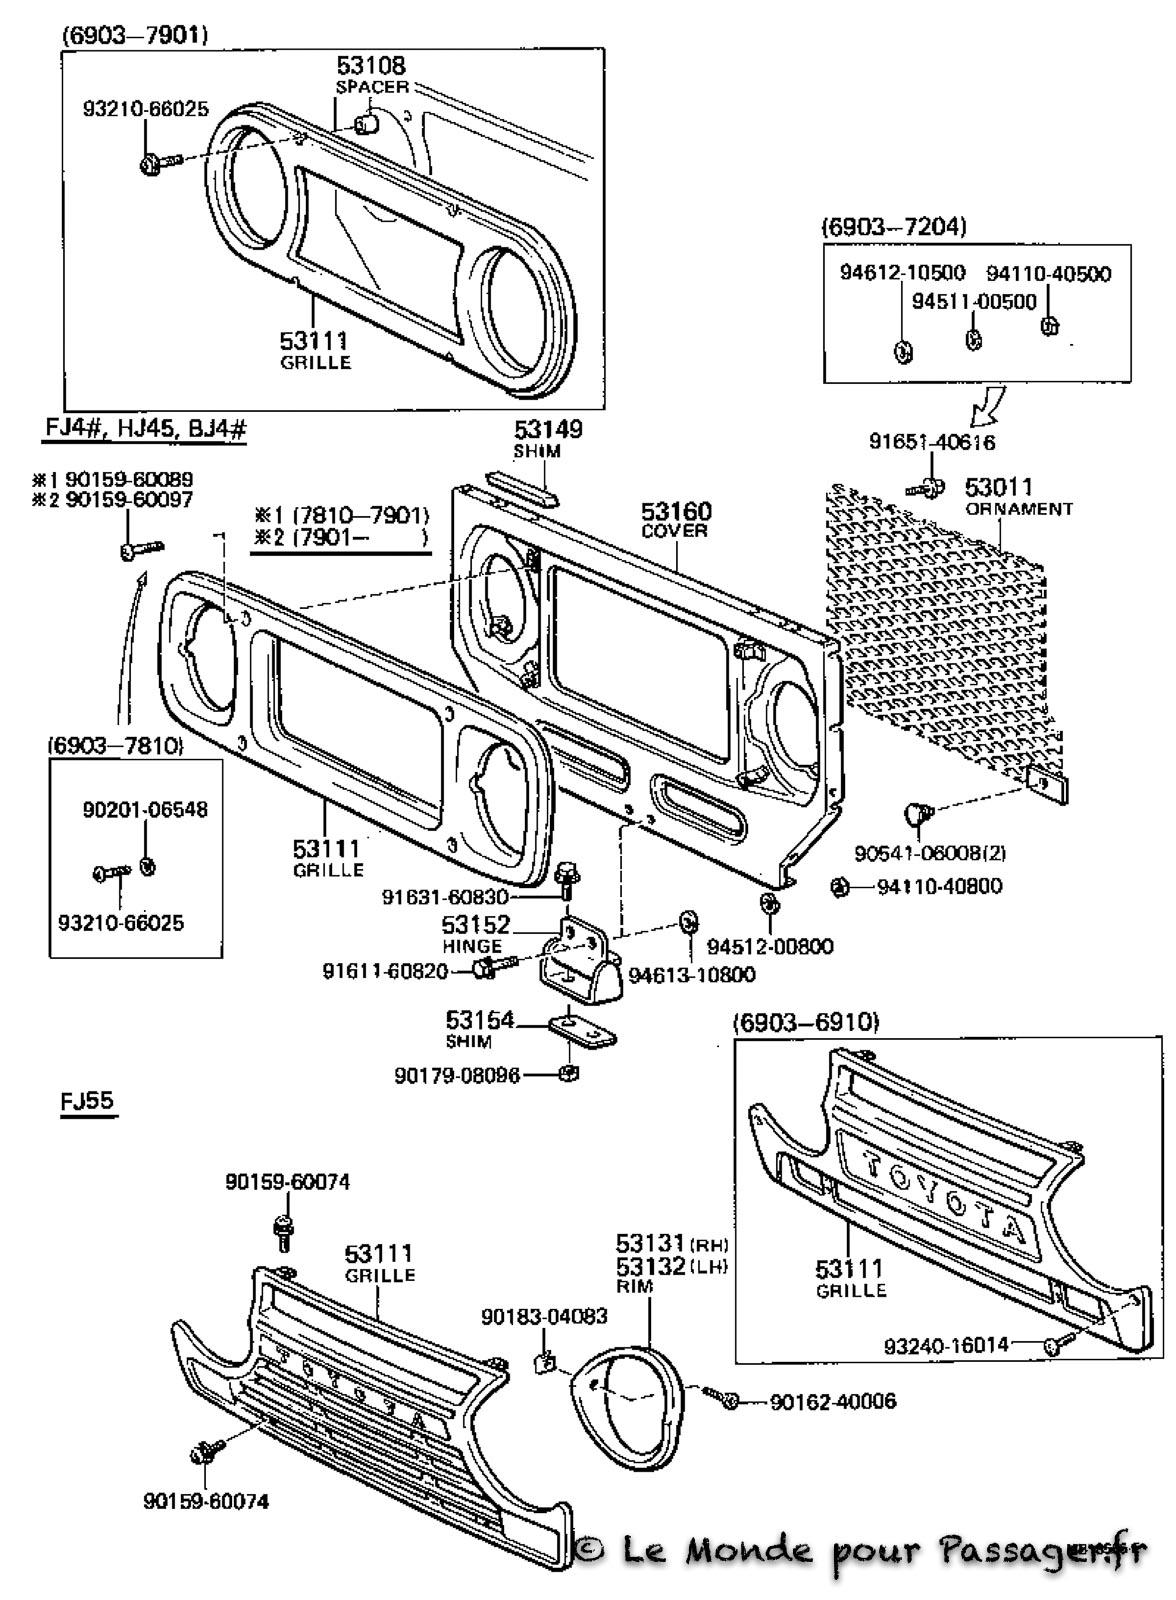 Fj55-Eclatés-Techniques063